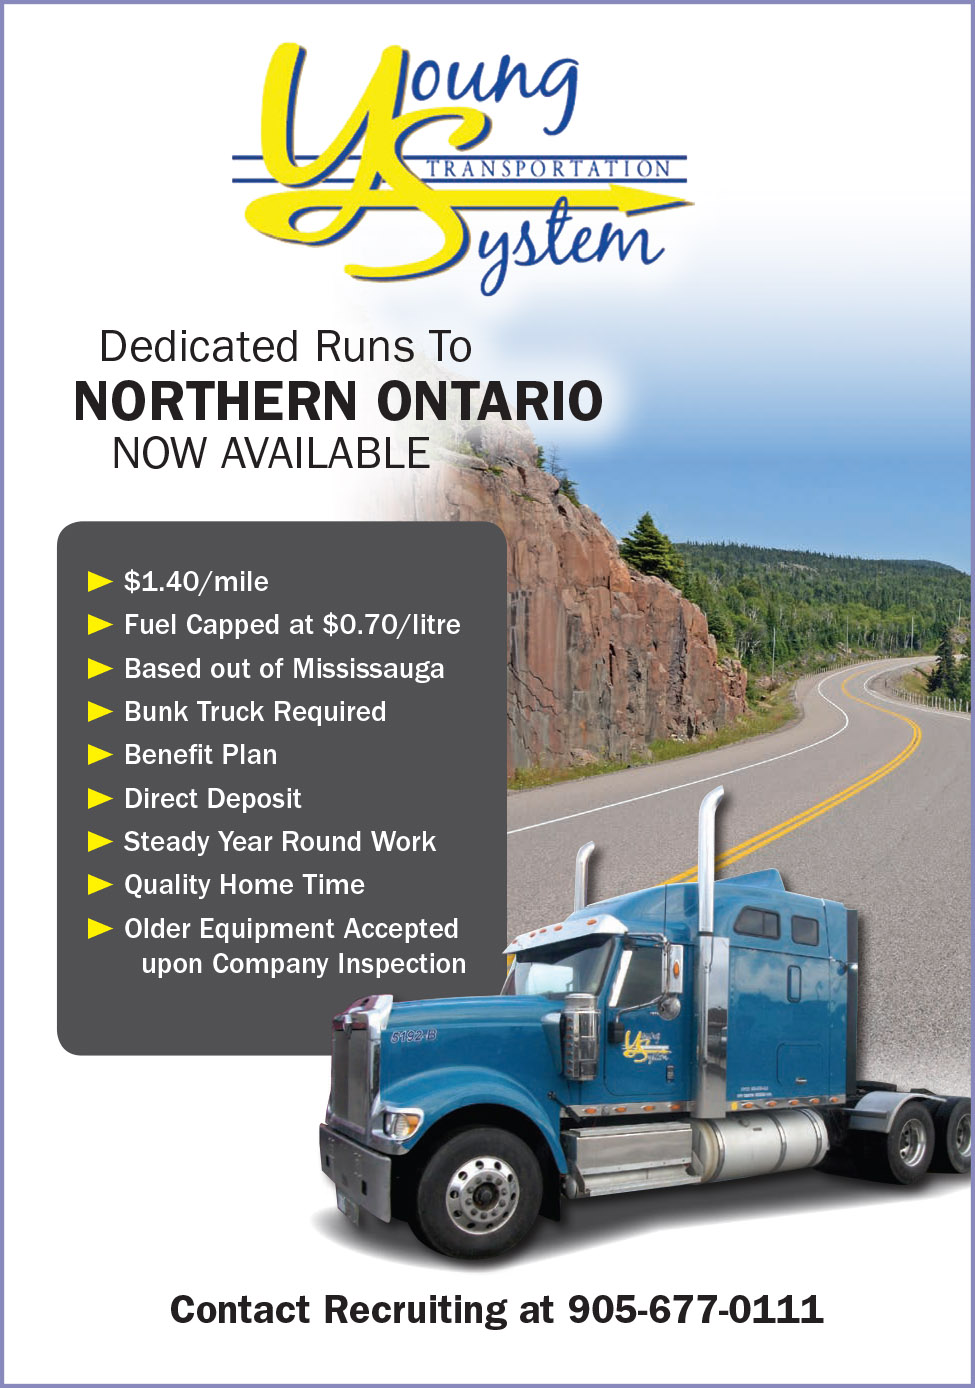 Young Transportation (Northern Ontario Runs)